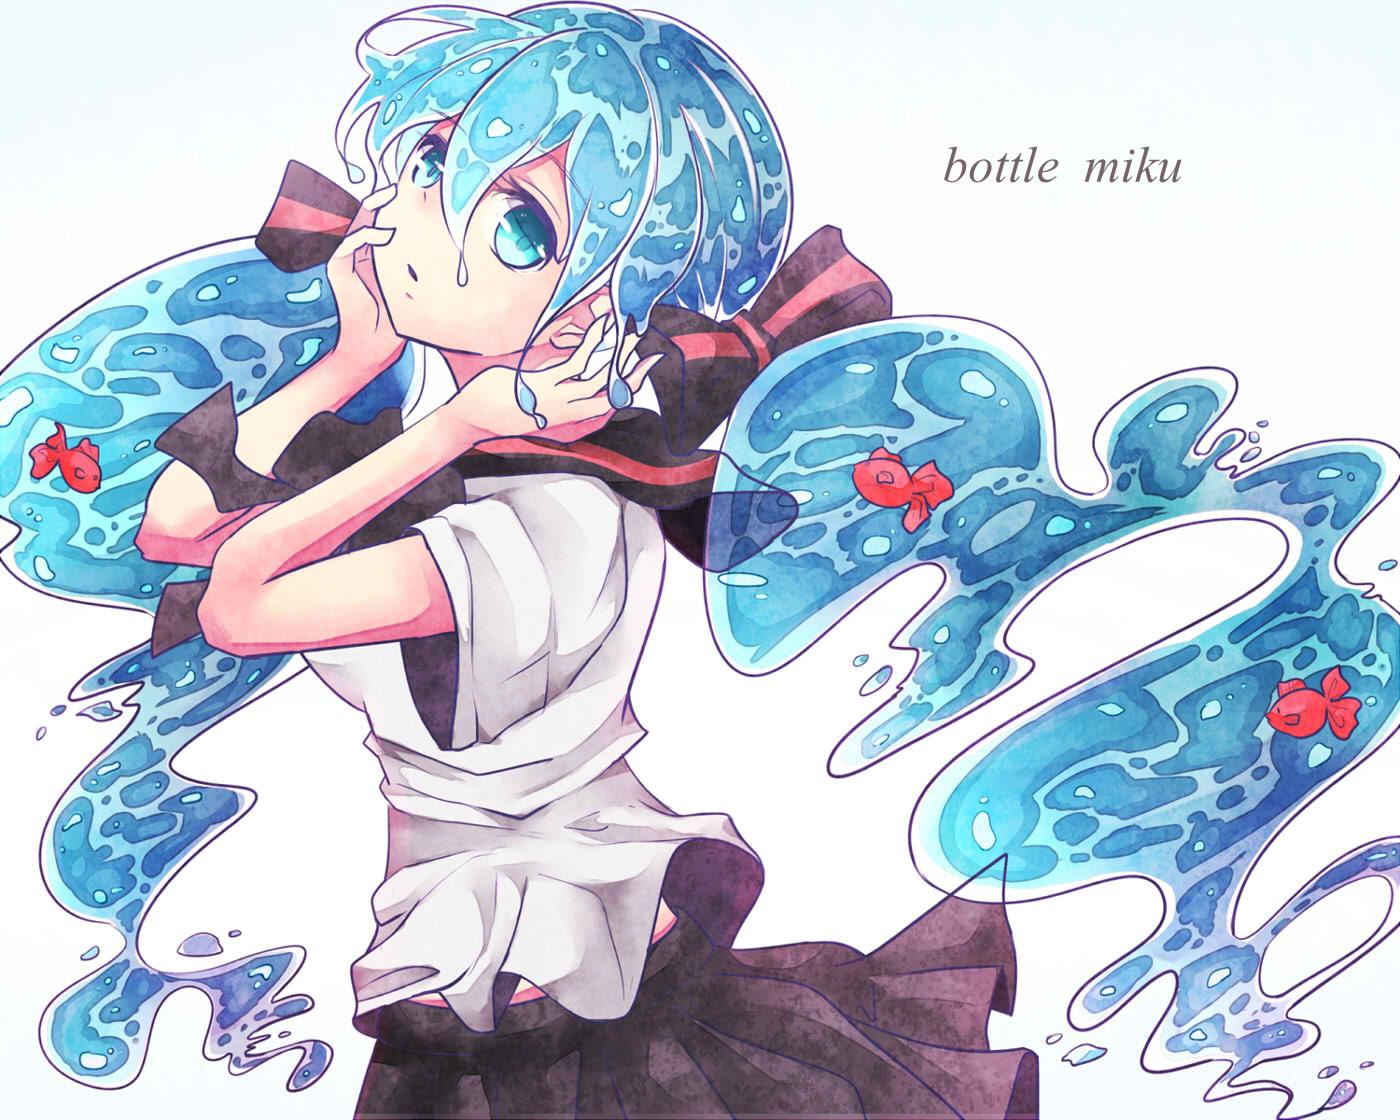 bottle_miku hatsune_miku sonoruru3131 vocaloid